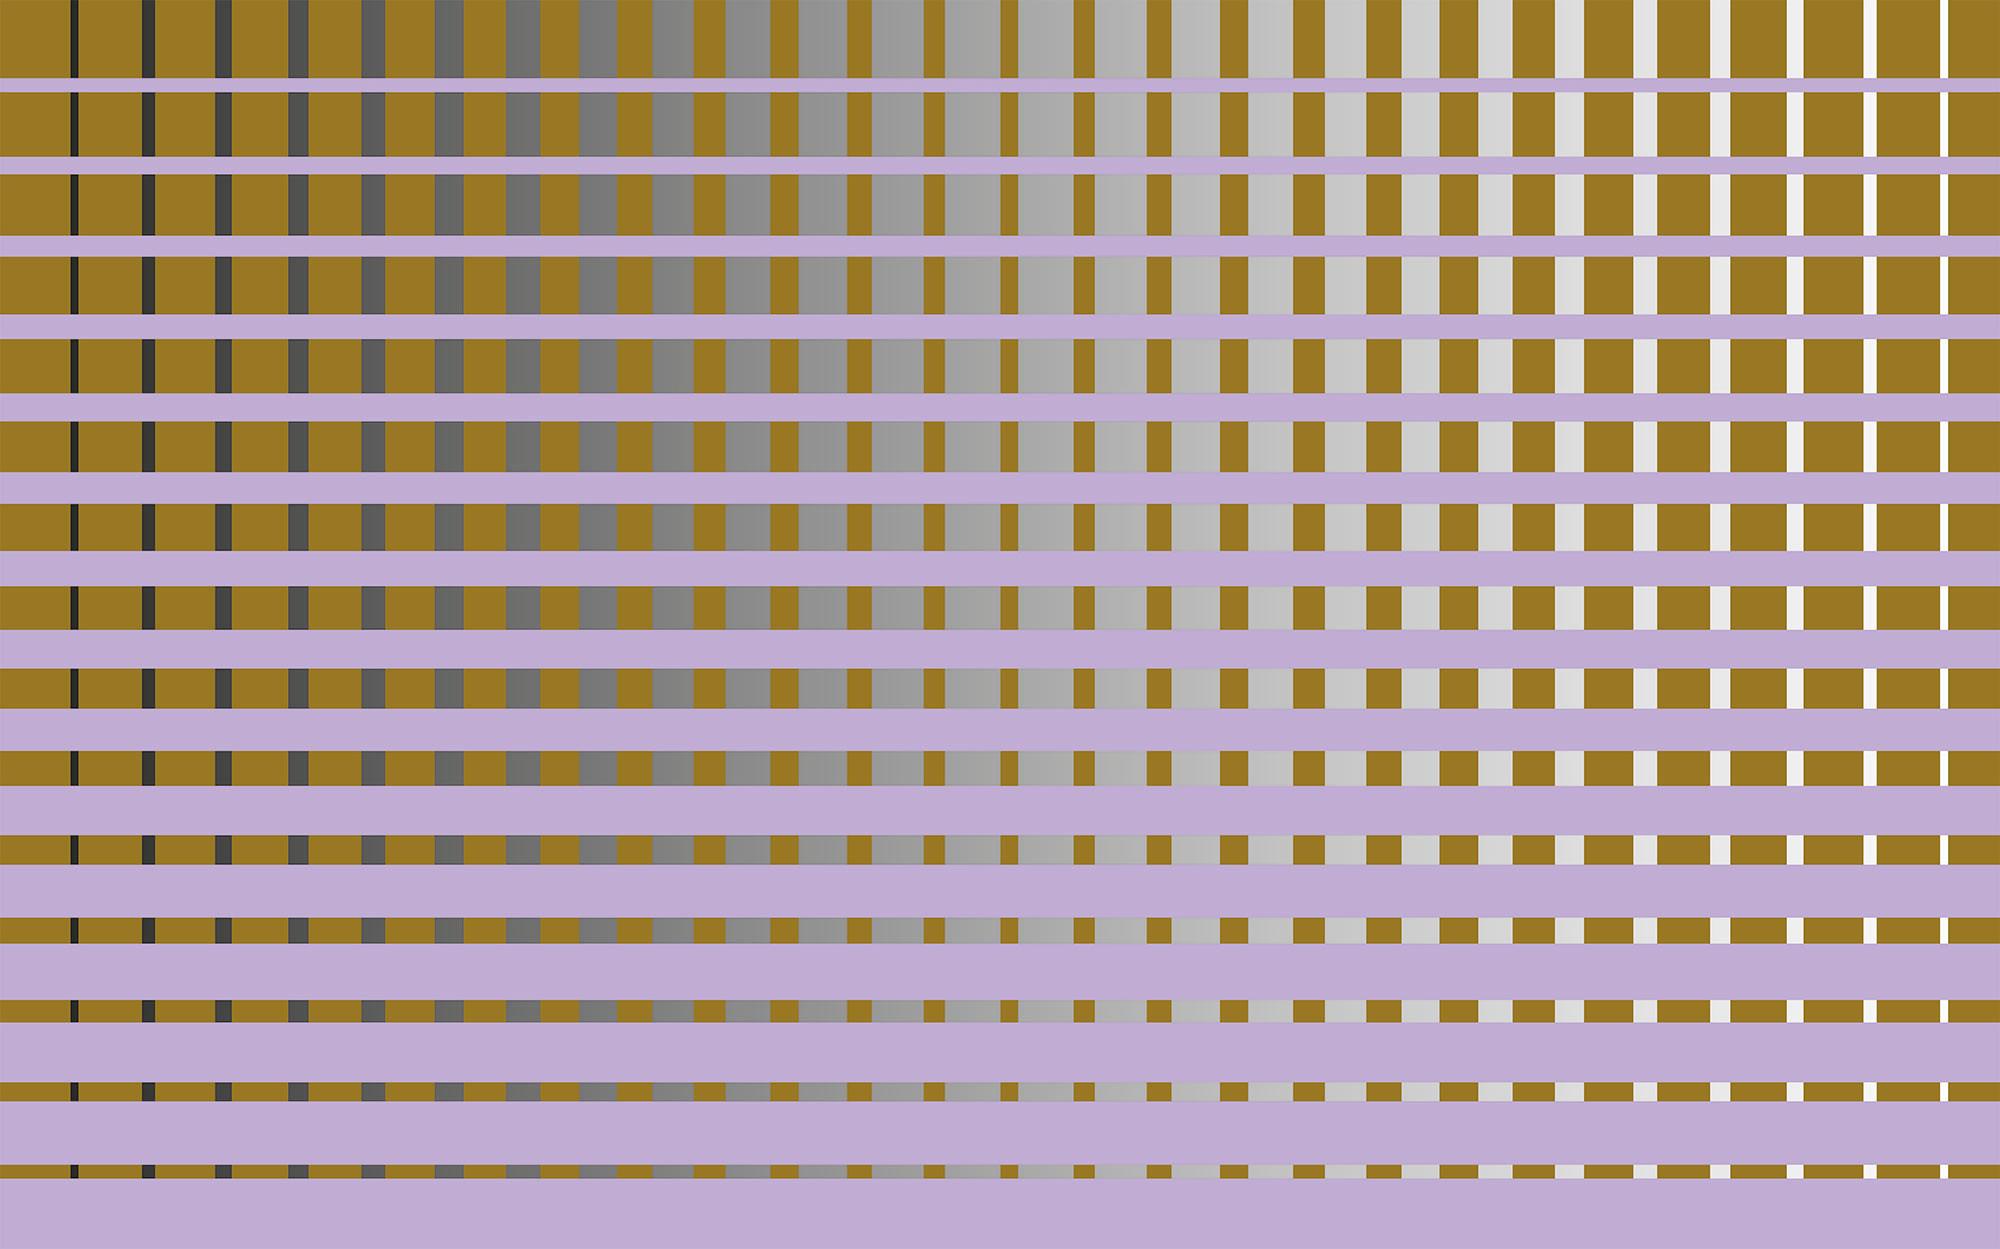 Griddy turquisecognac-violett